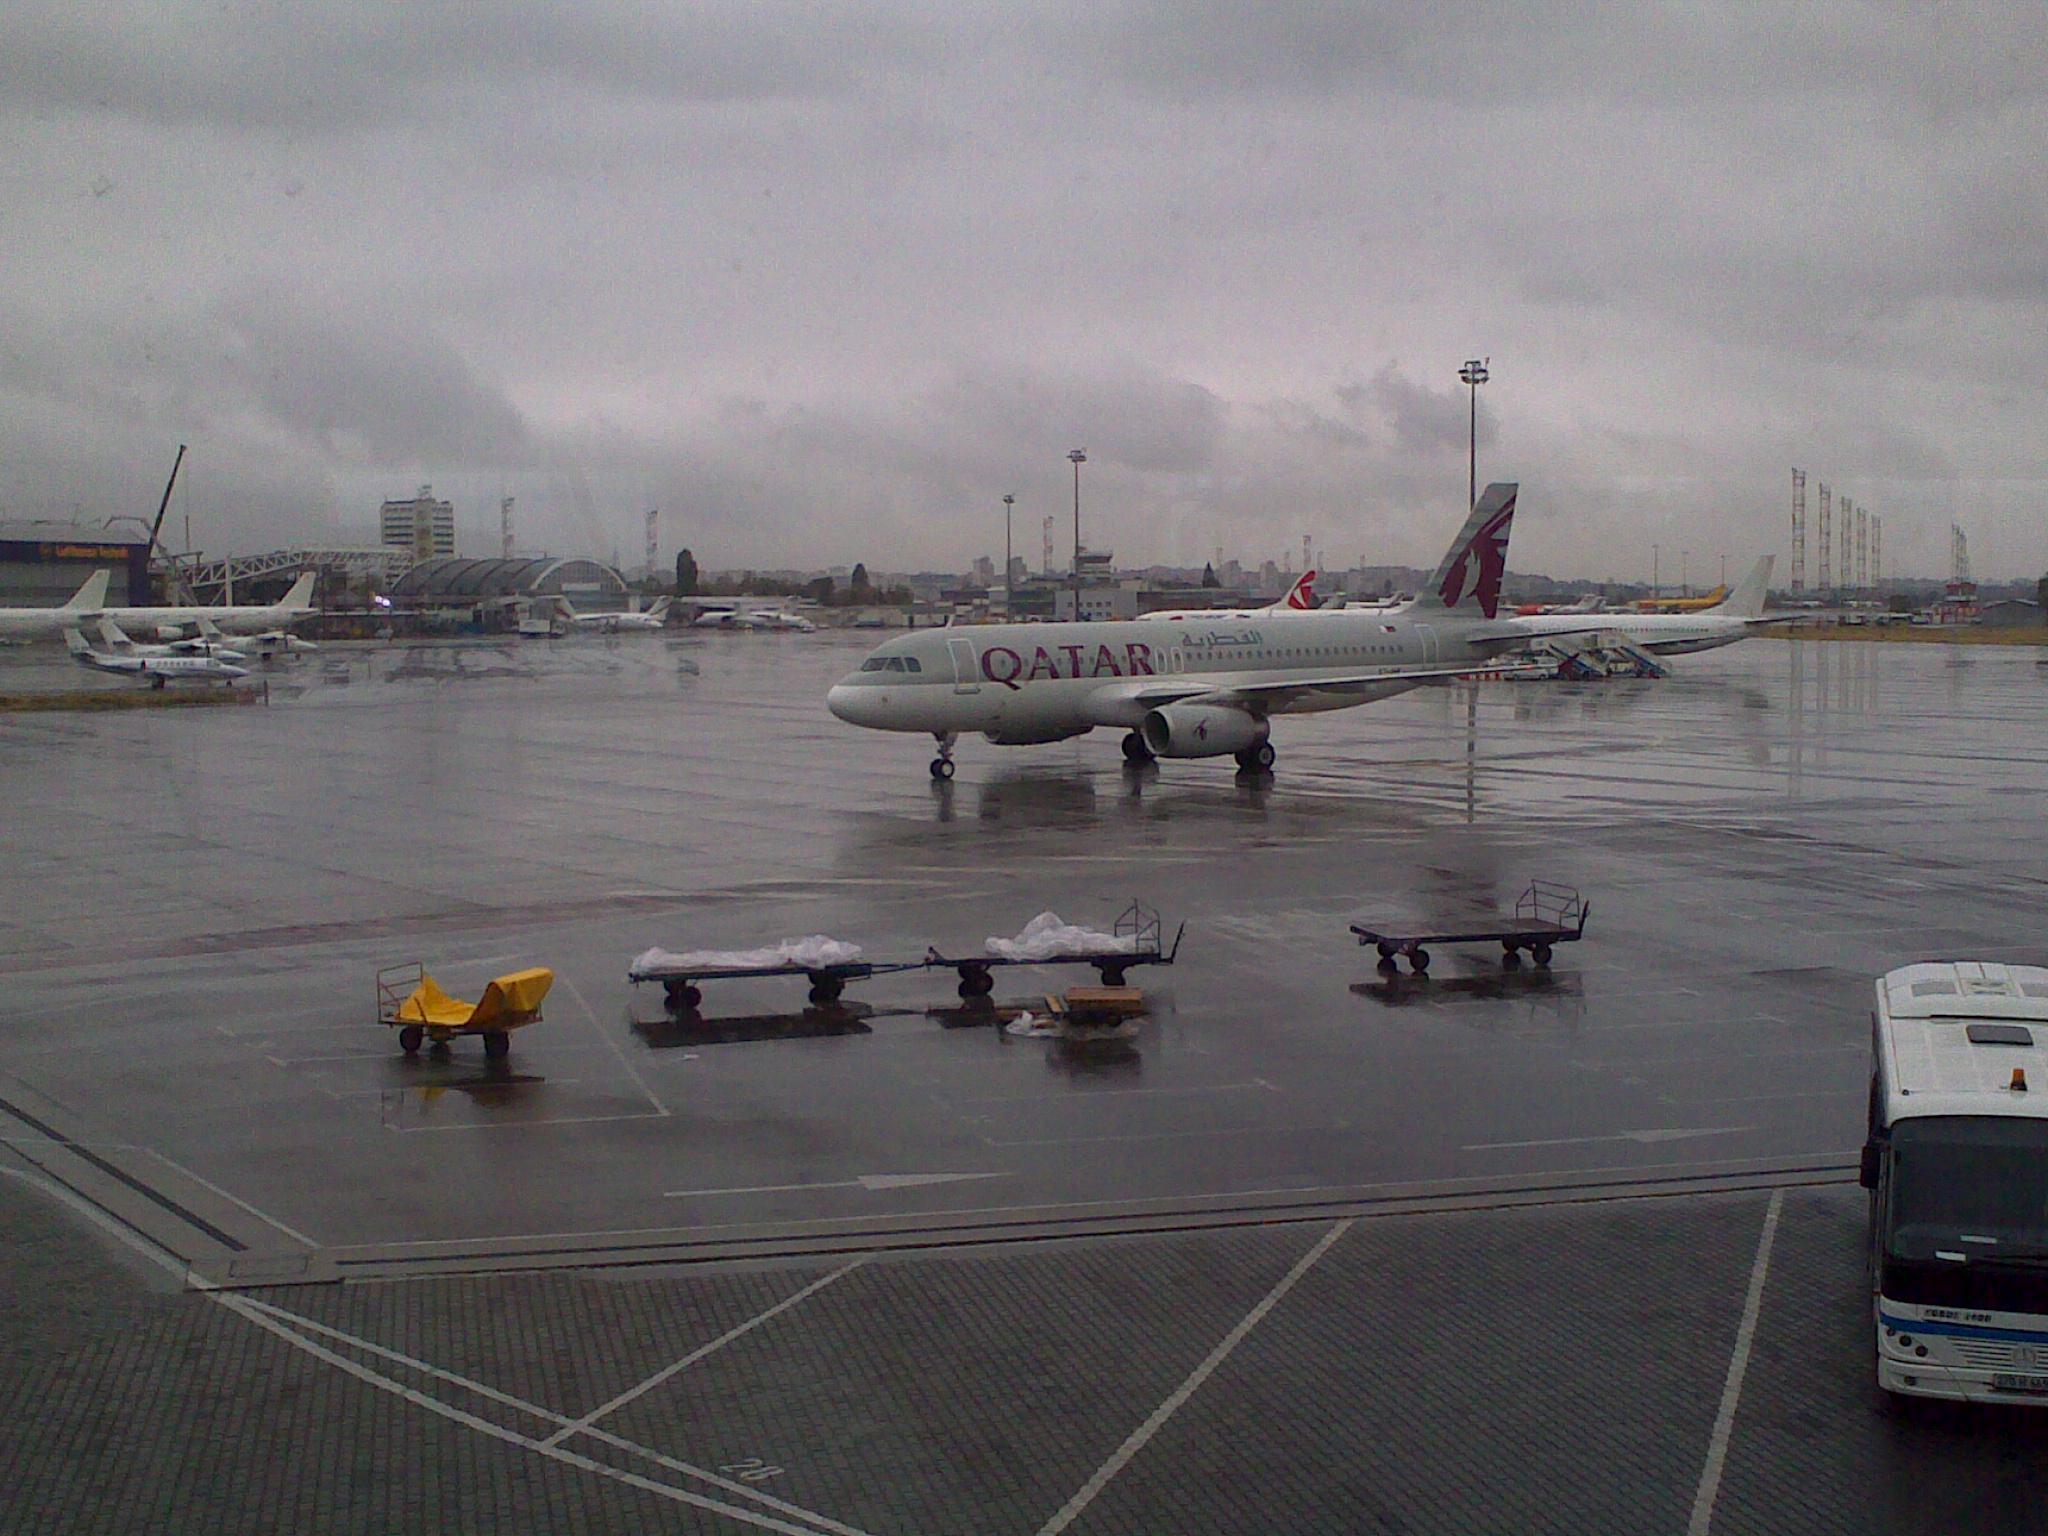 Aeroporto Qatar : File sofia airport qatar airways g wikimedia commons